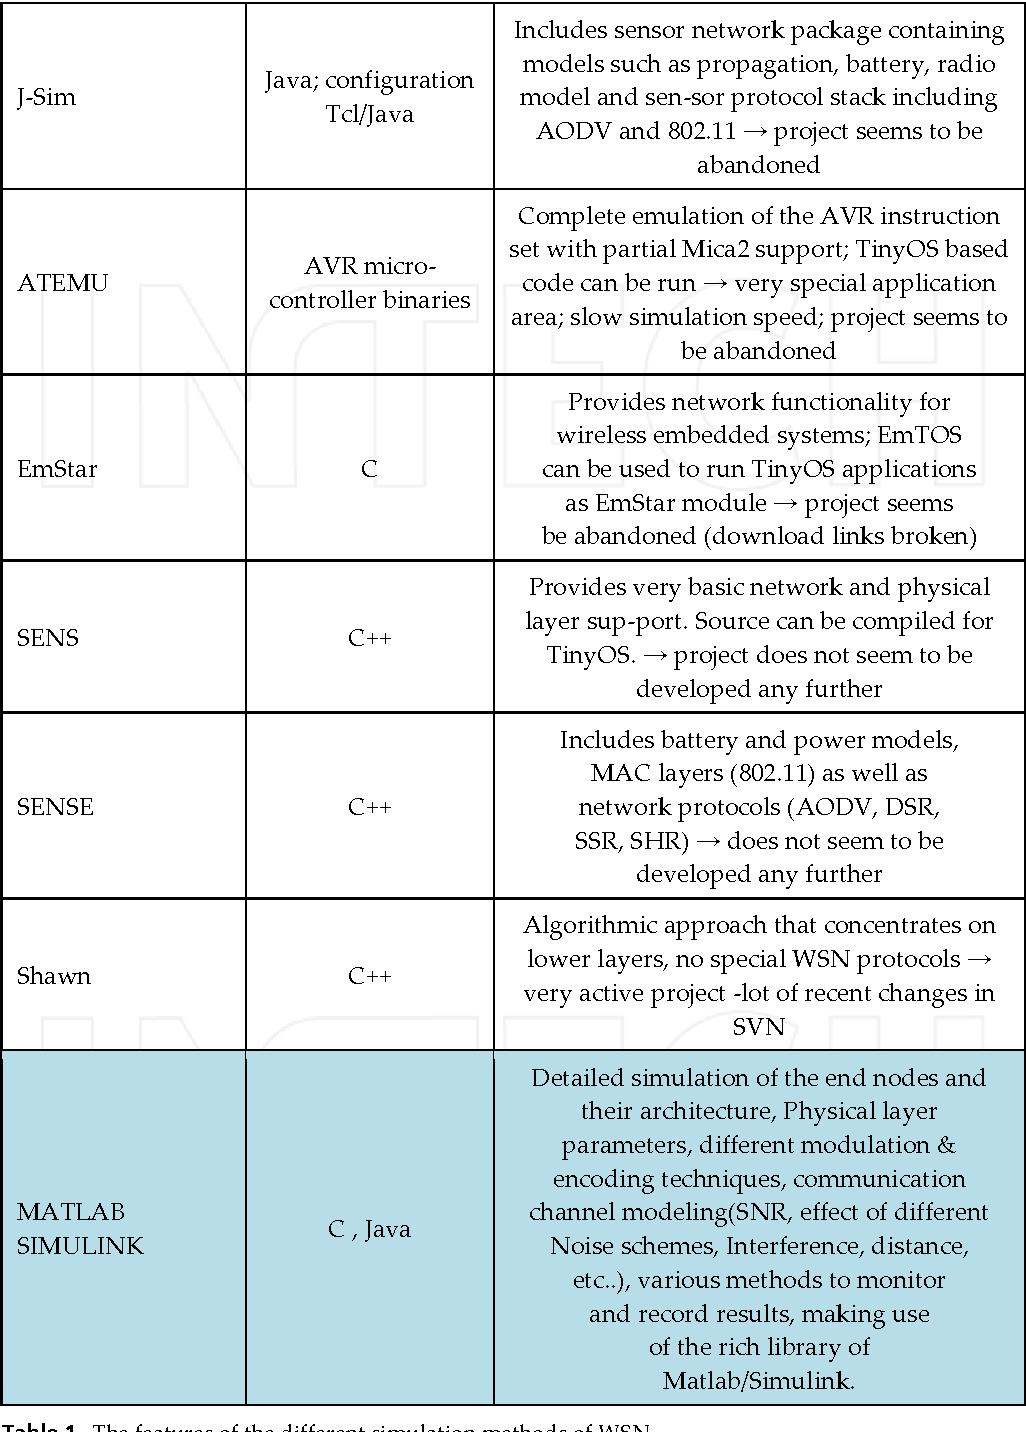 Table 1 from Simulation Framework of Wireless Sensor Network